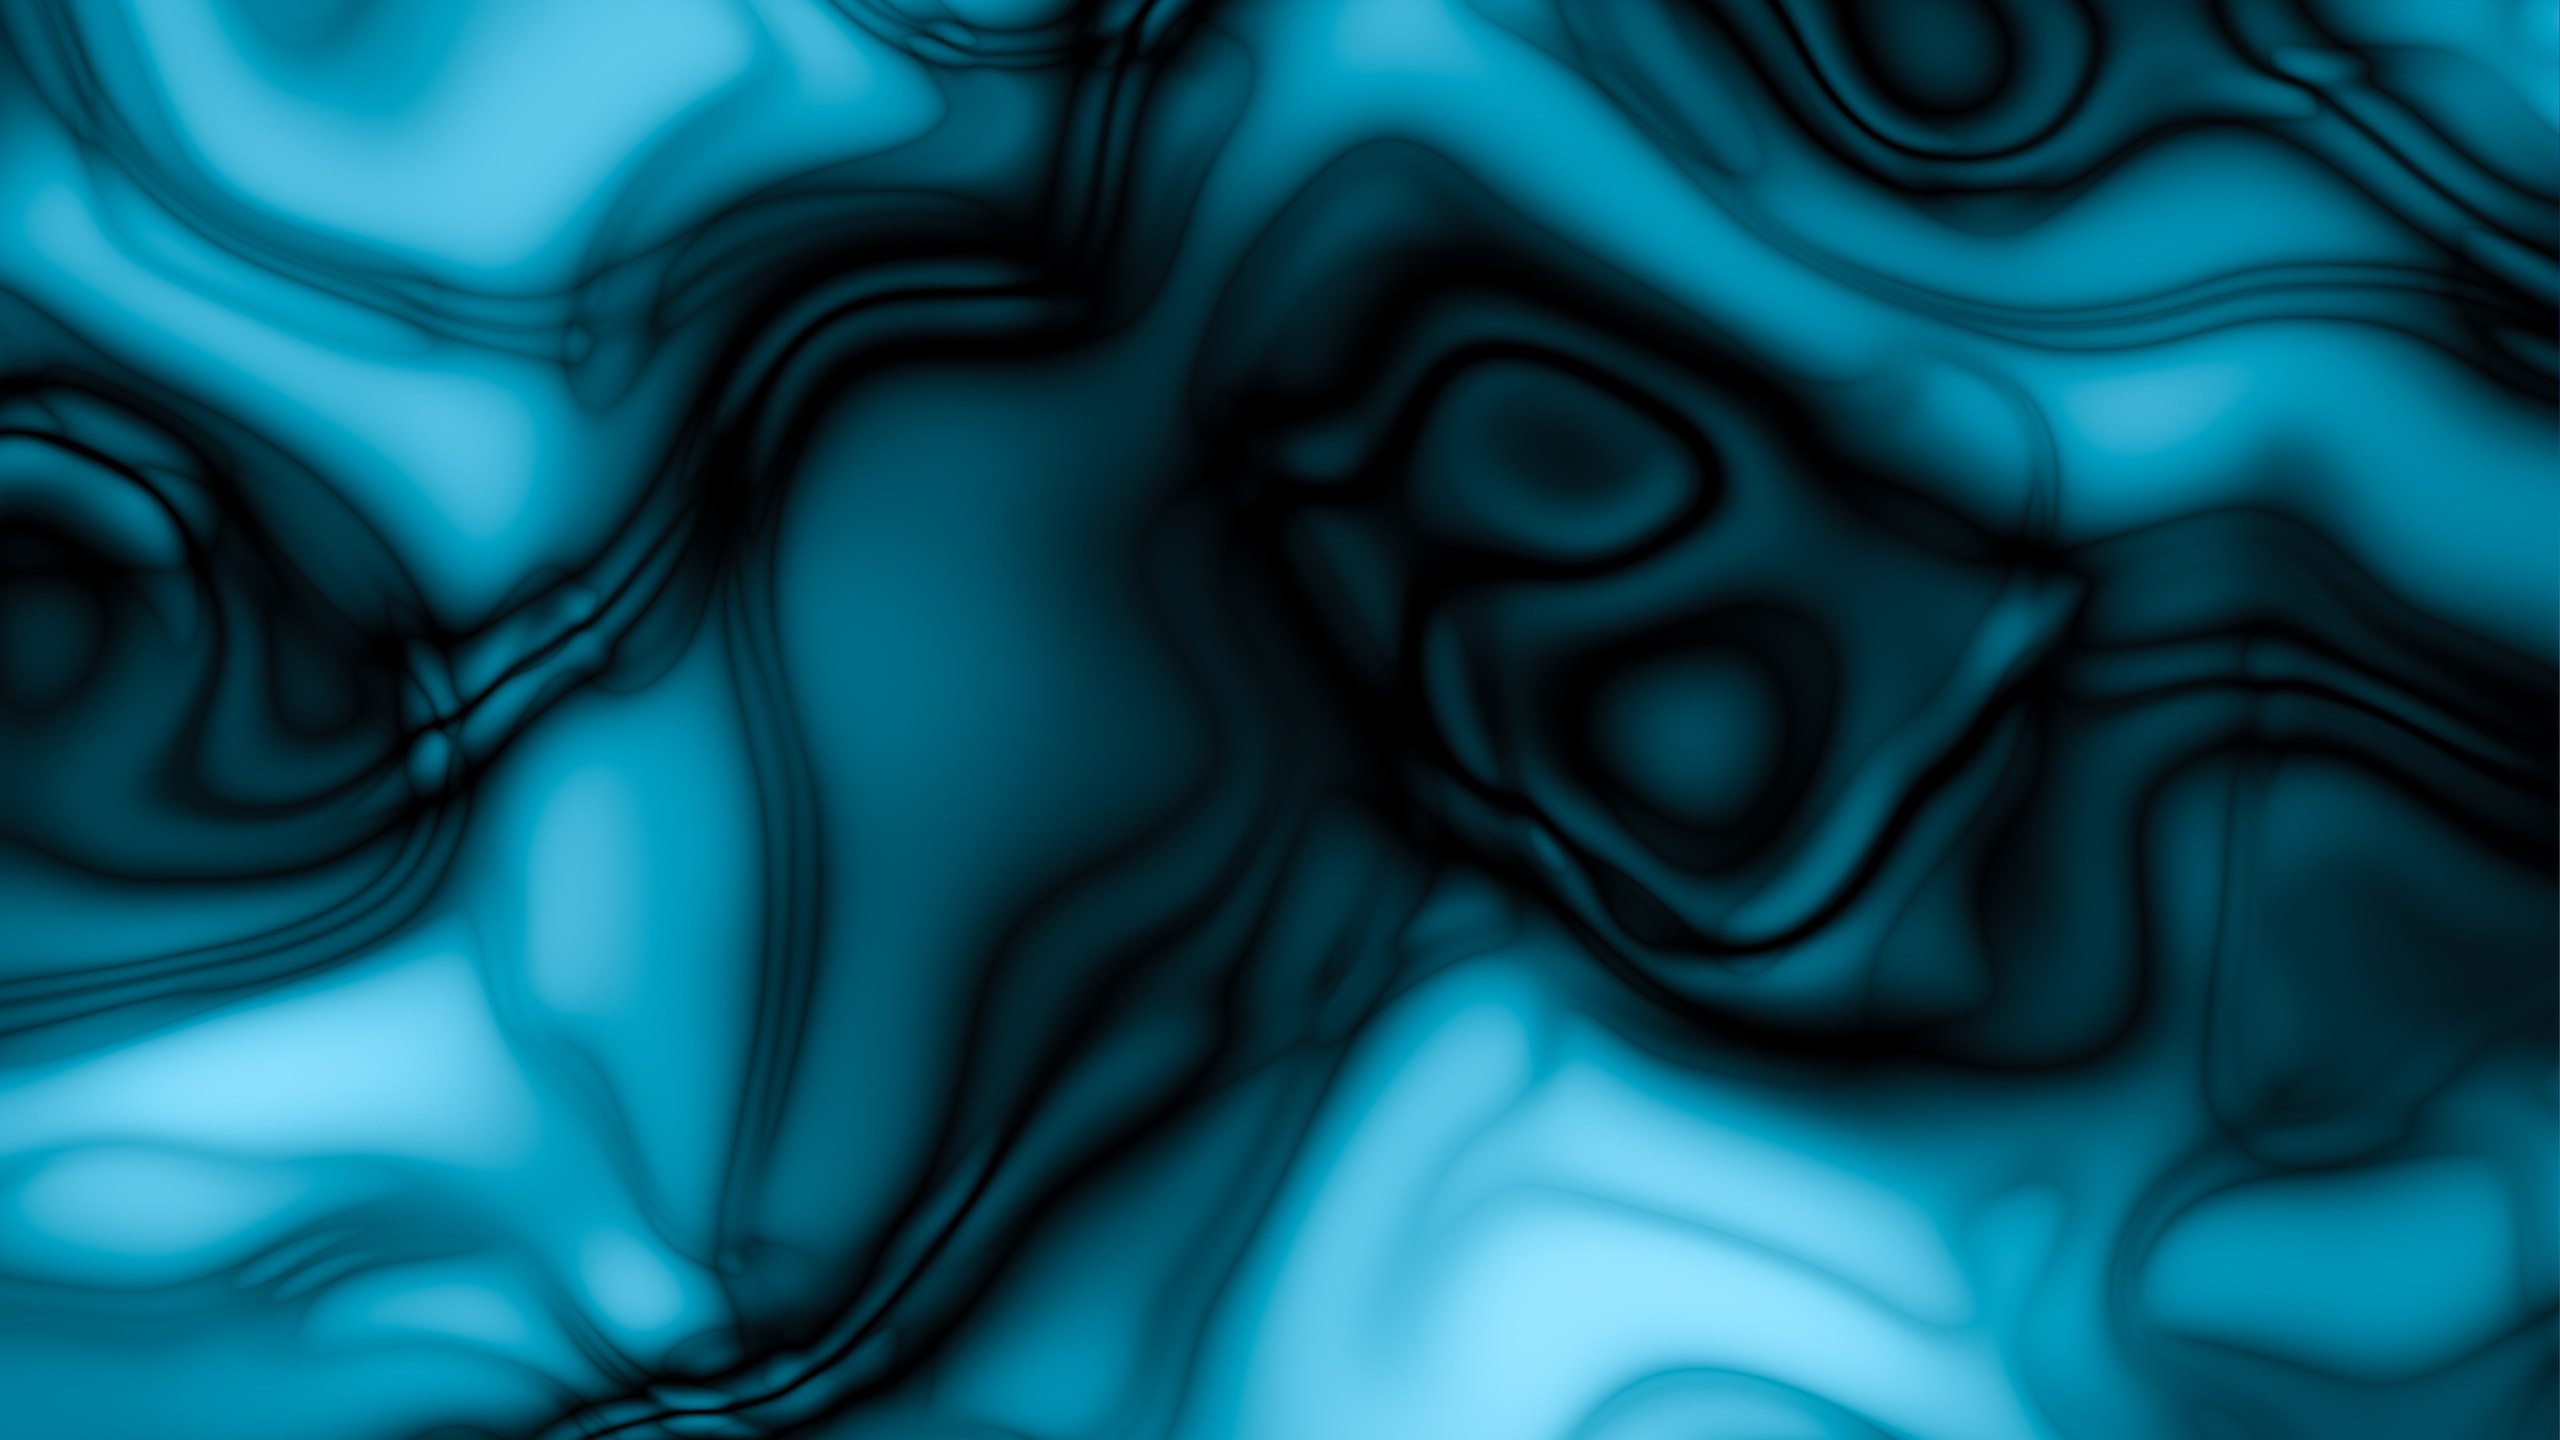 blue-black-matter-abstract-8k-0i.jpg